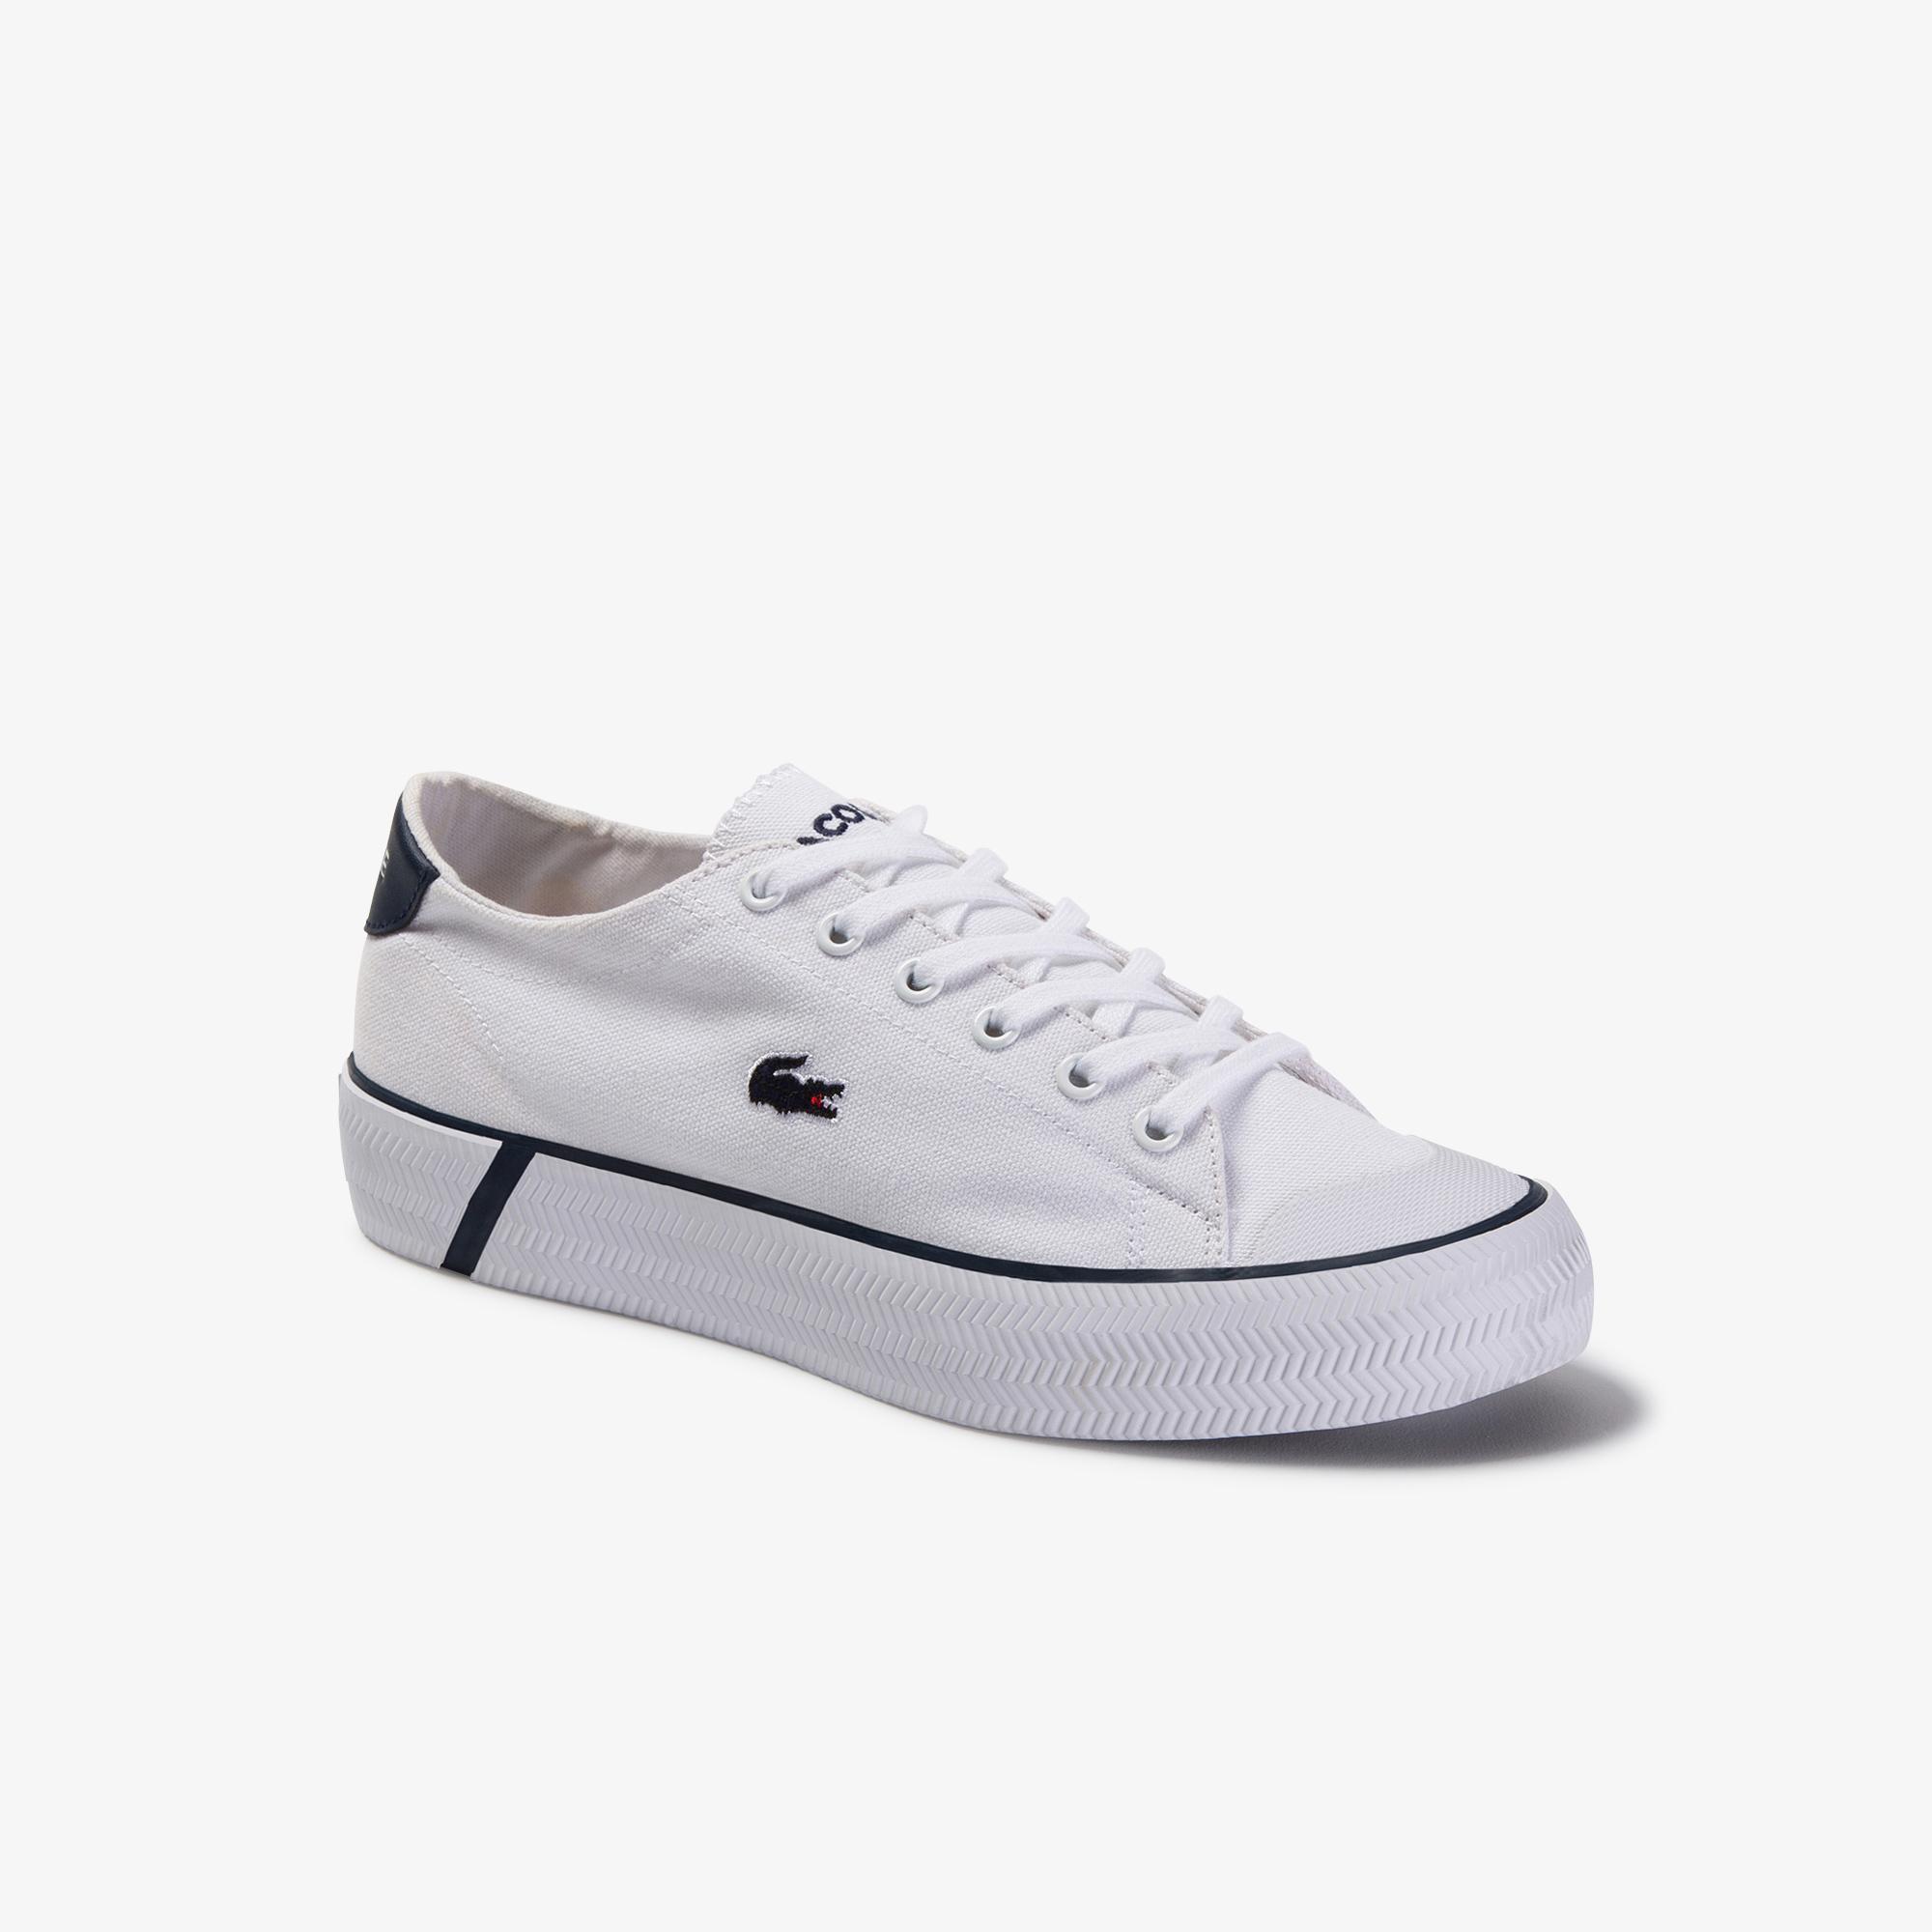 Lacoste Gripshot 120 2 Damskie Sneakersy